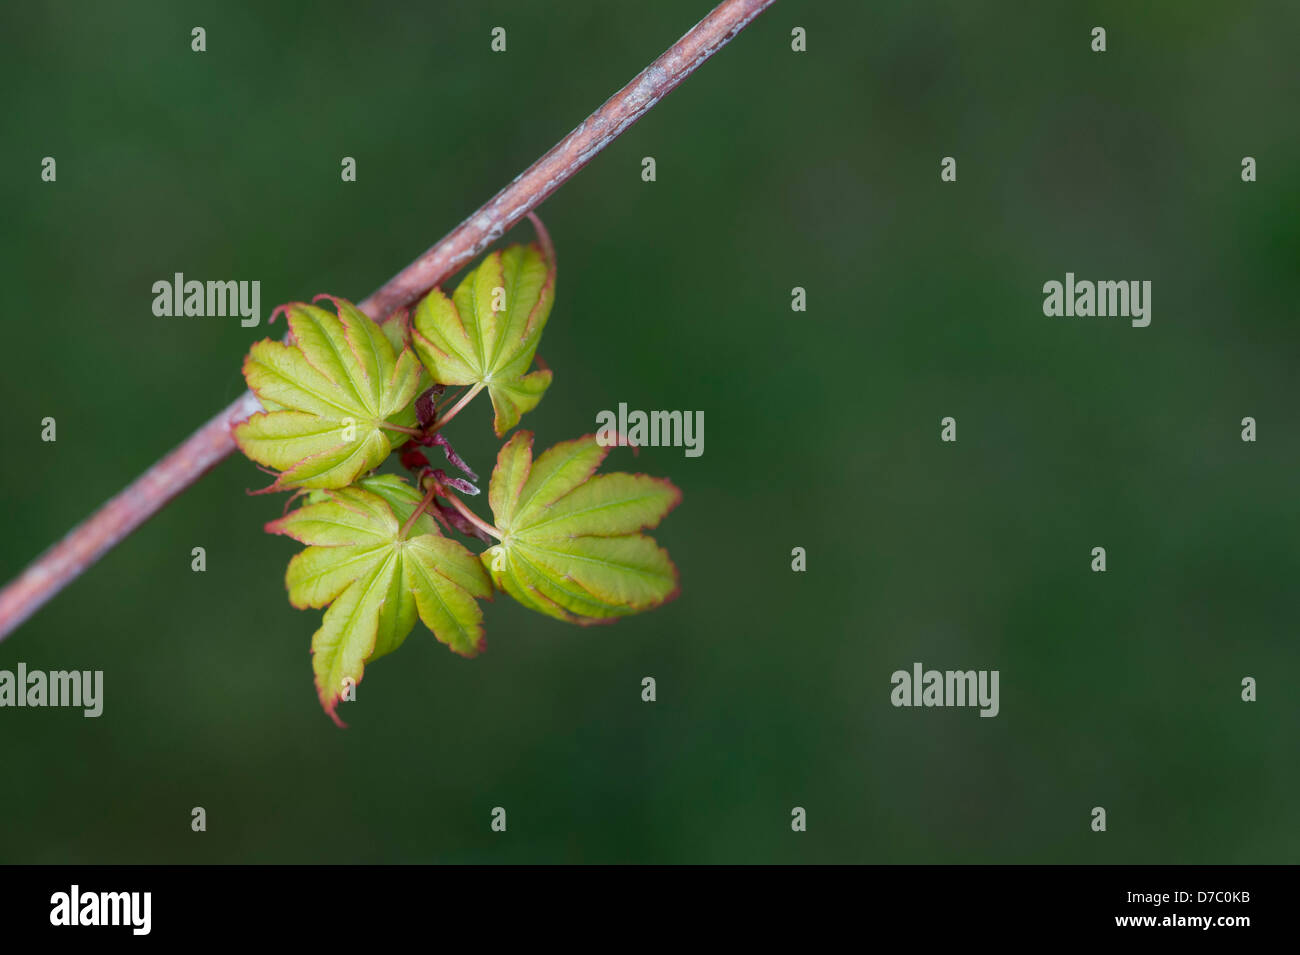 Acer palmatum sango kaku. Spring leaves emerging on a Japanese Maple tree Stock Photo